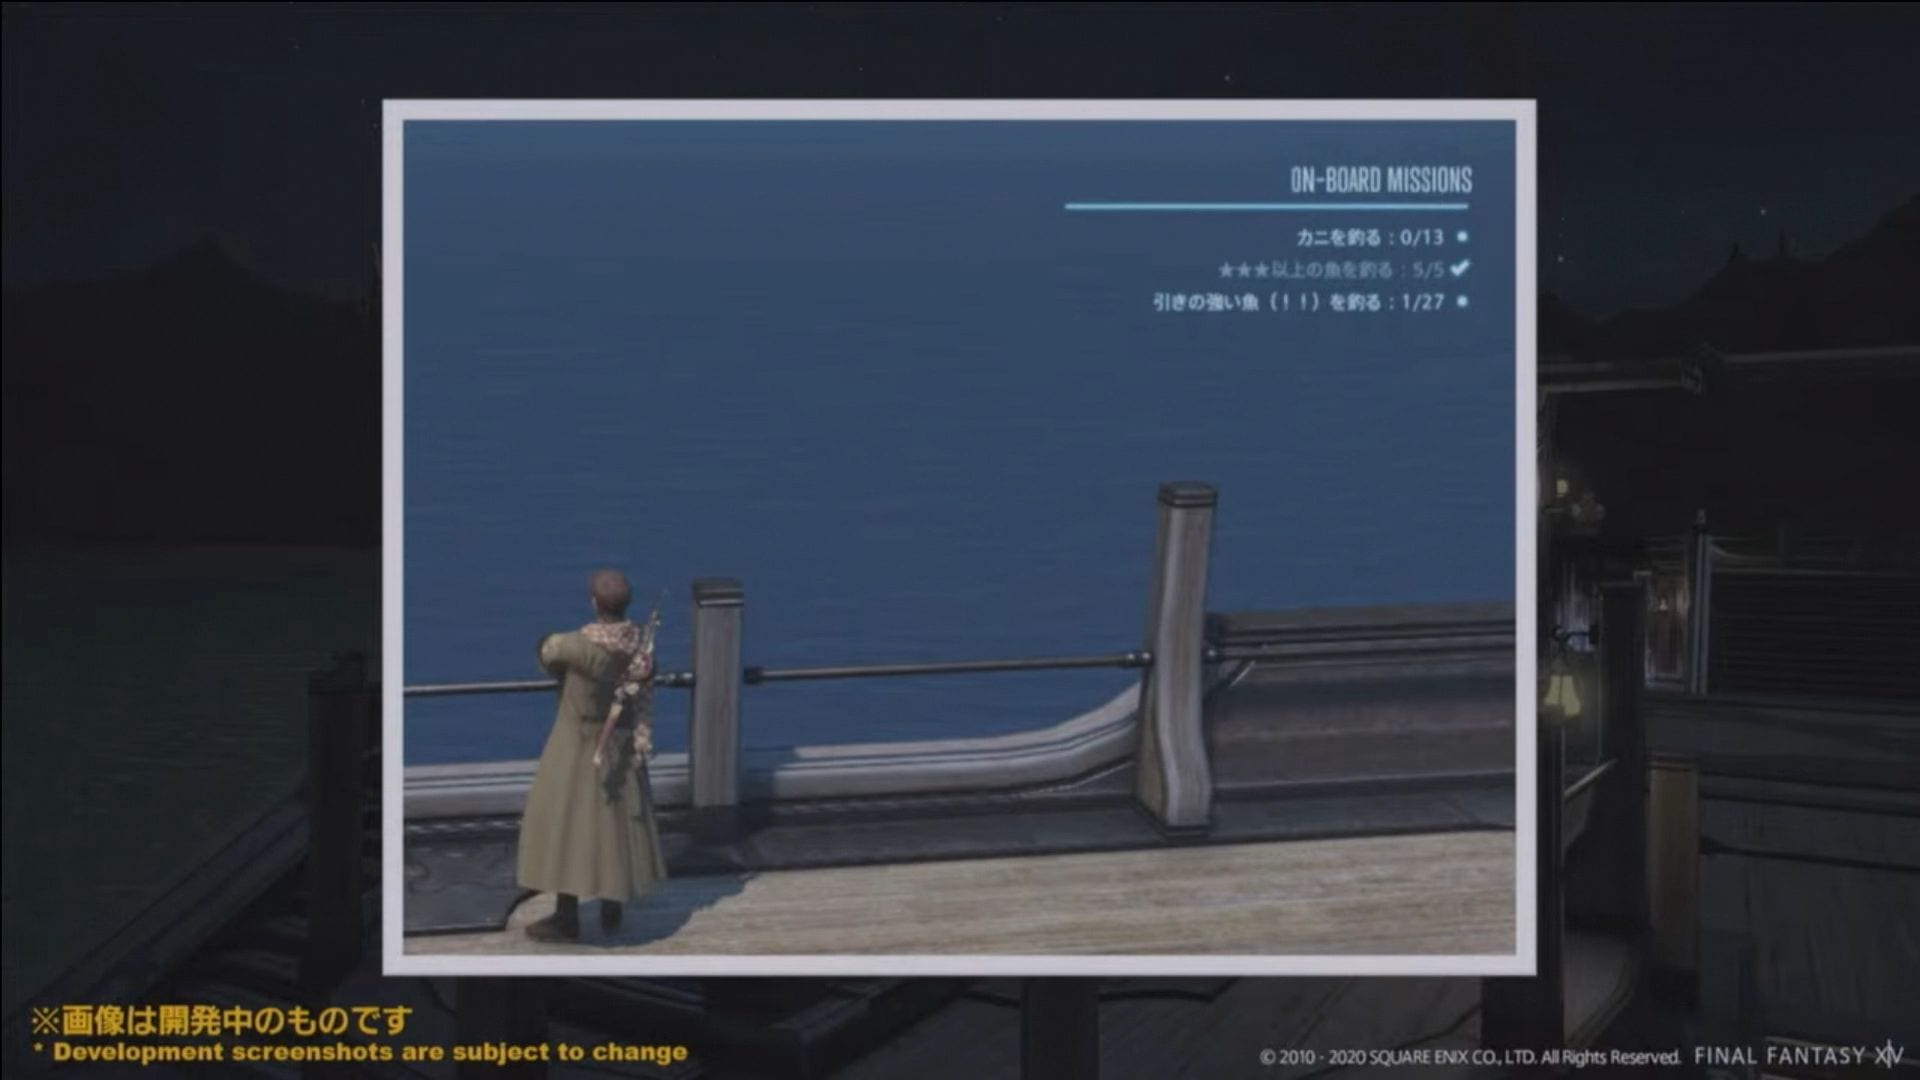 Final-Fantasy-XIV-Screenshot-2020-11-27-13-26-08.jpg